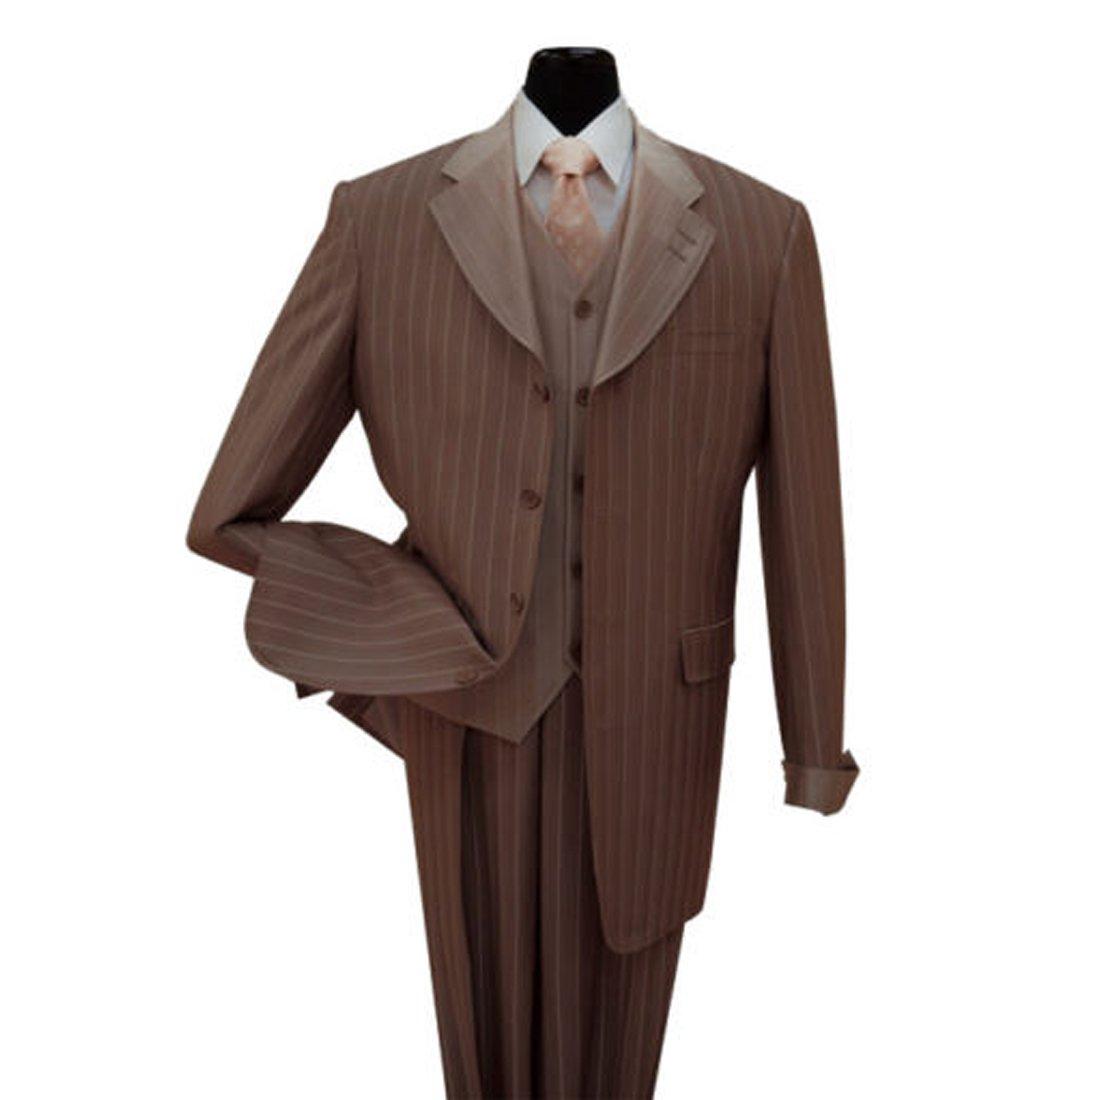 Milano Moda Men's 3 piece Luxurious Classic Gangster Pinstripe Wool Feel Suit 2911 by Milano Moda